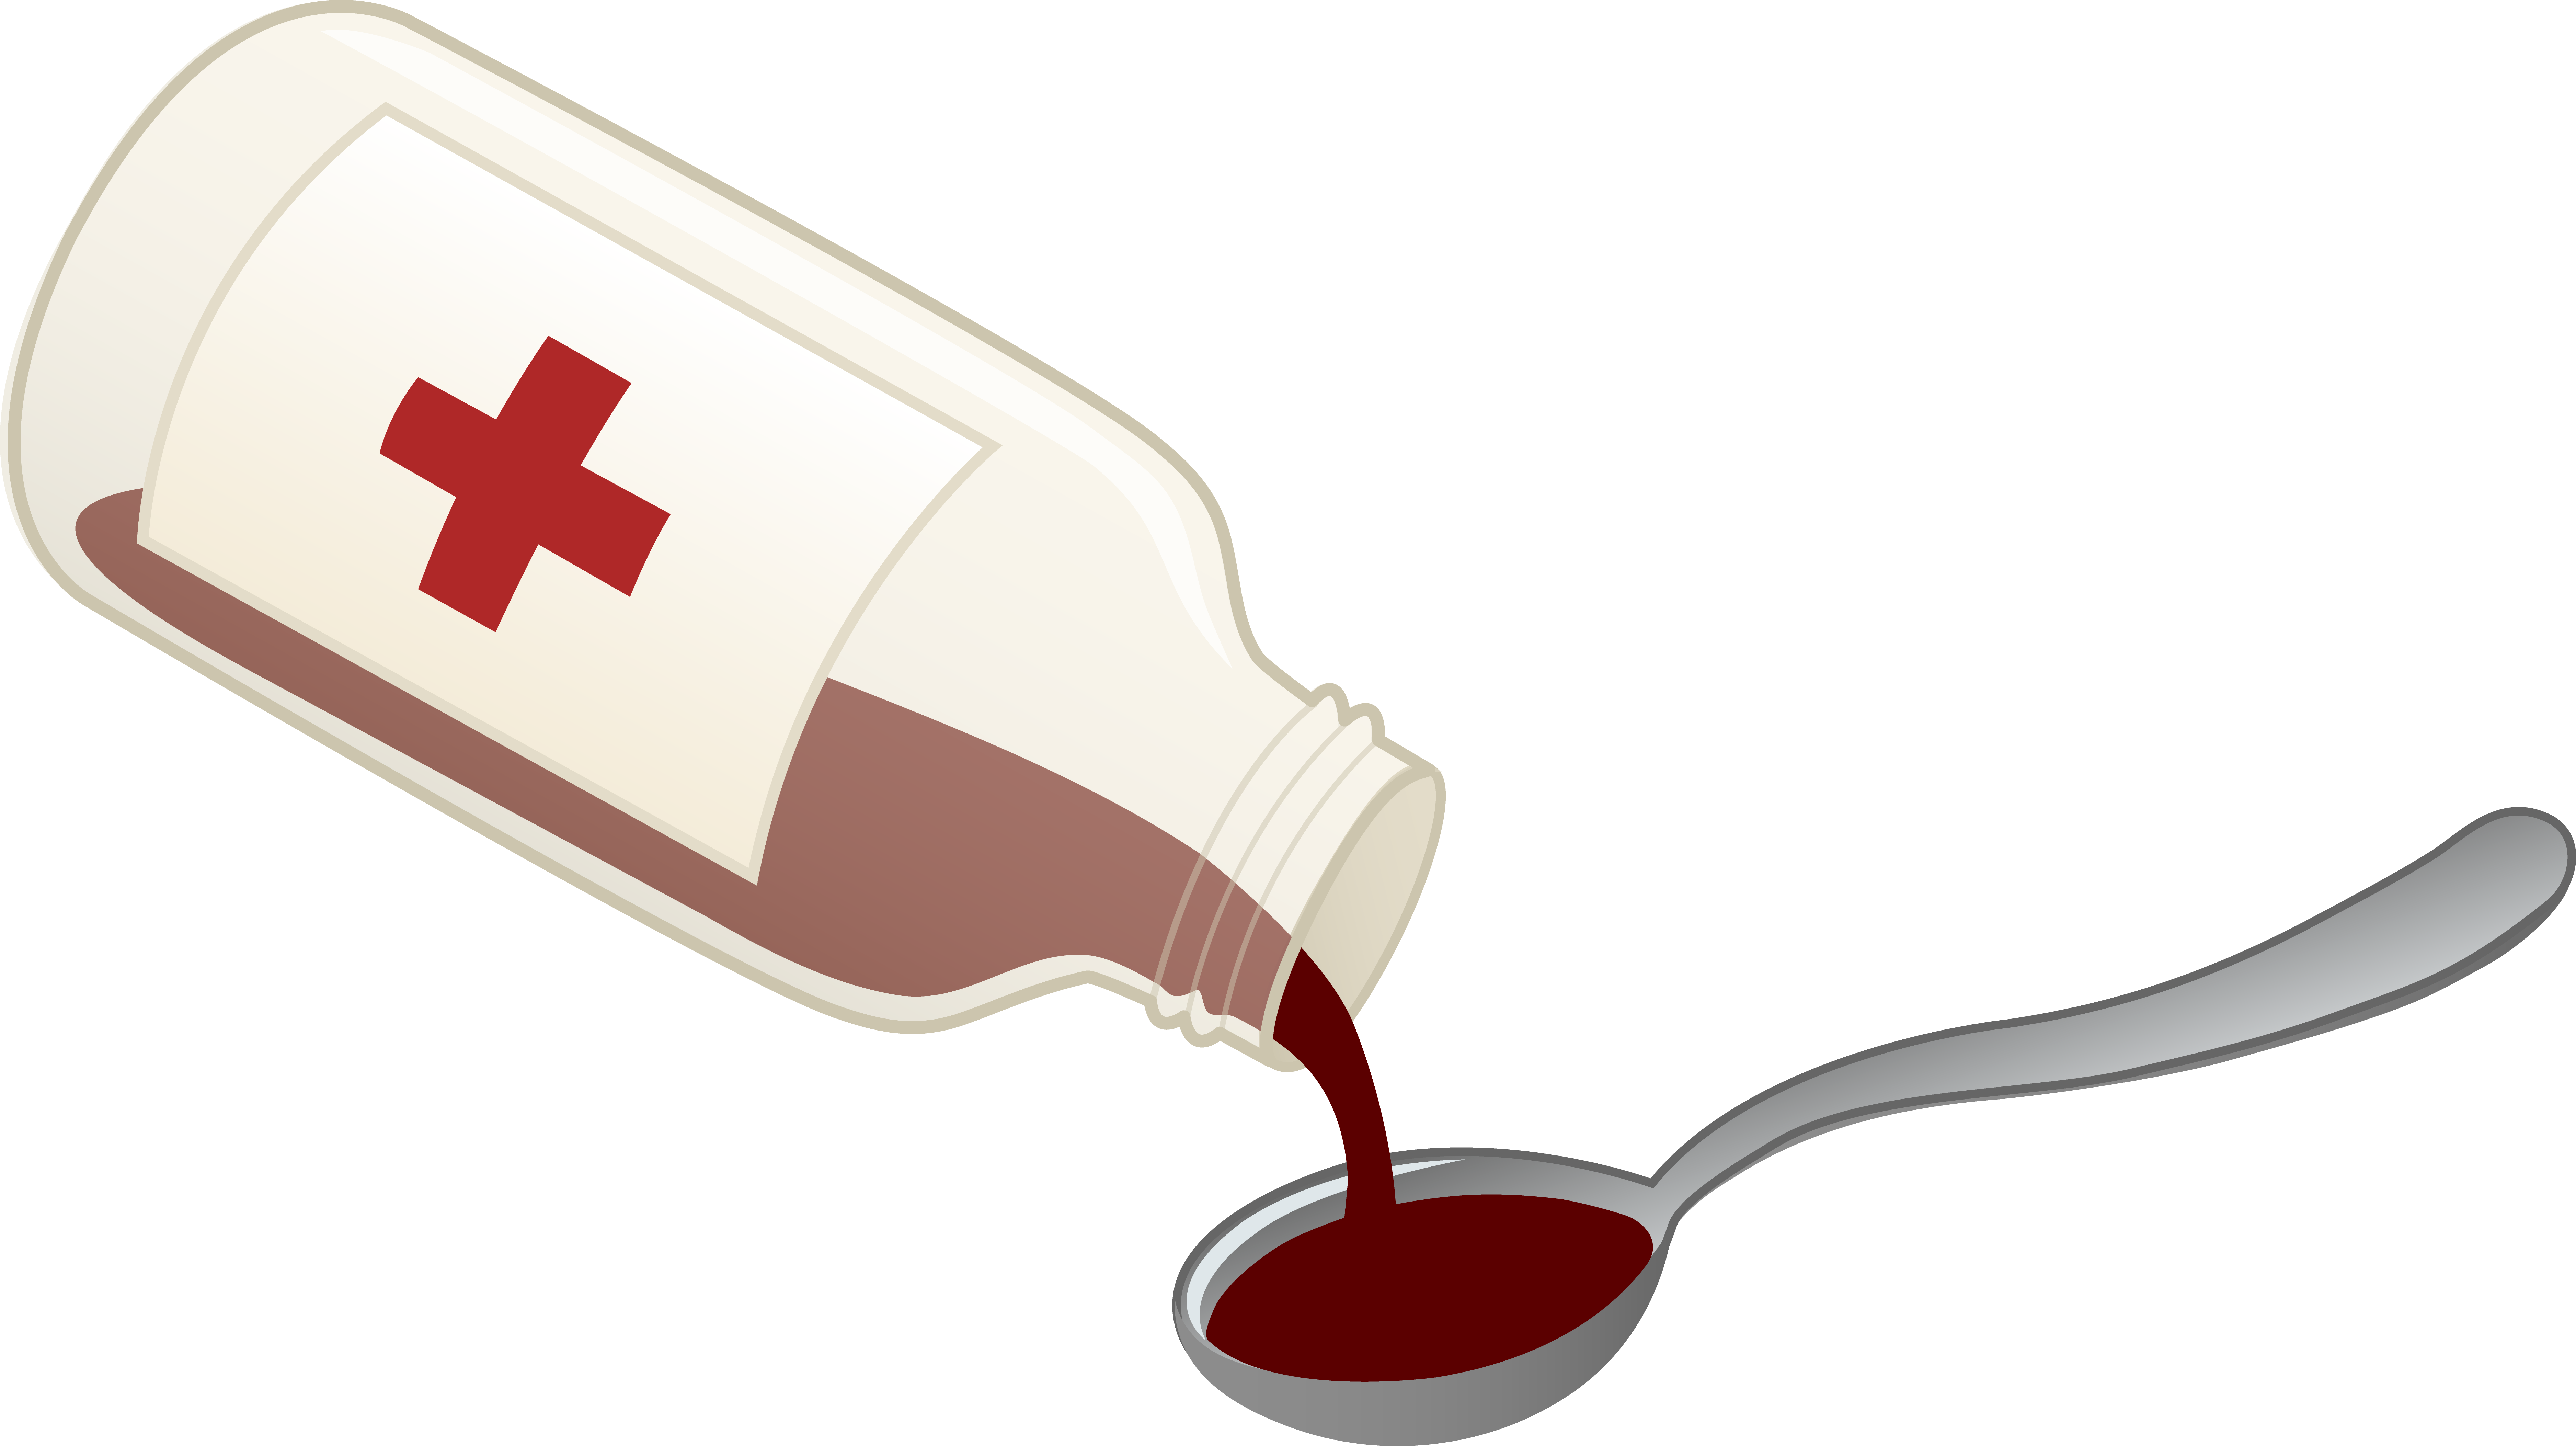 Cough clipart liquid medicine. Syrup clip art billigakontaktlinser